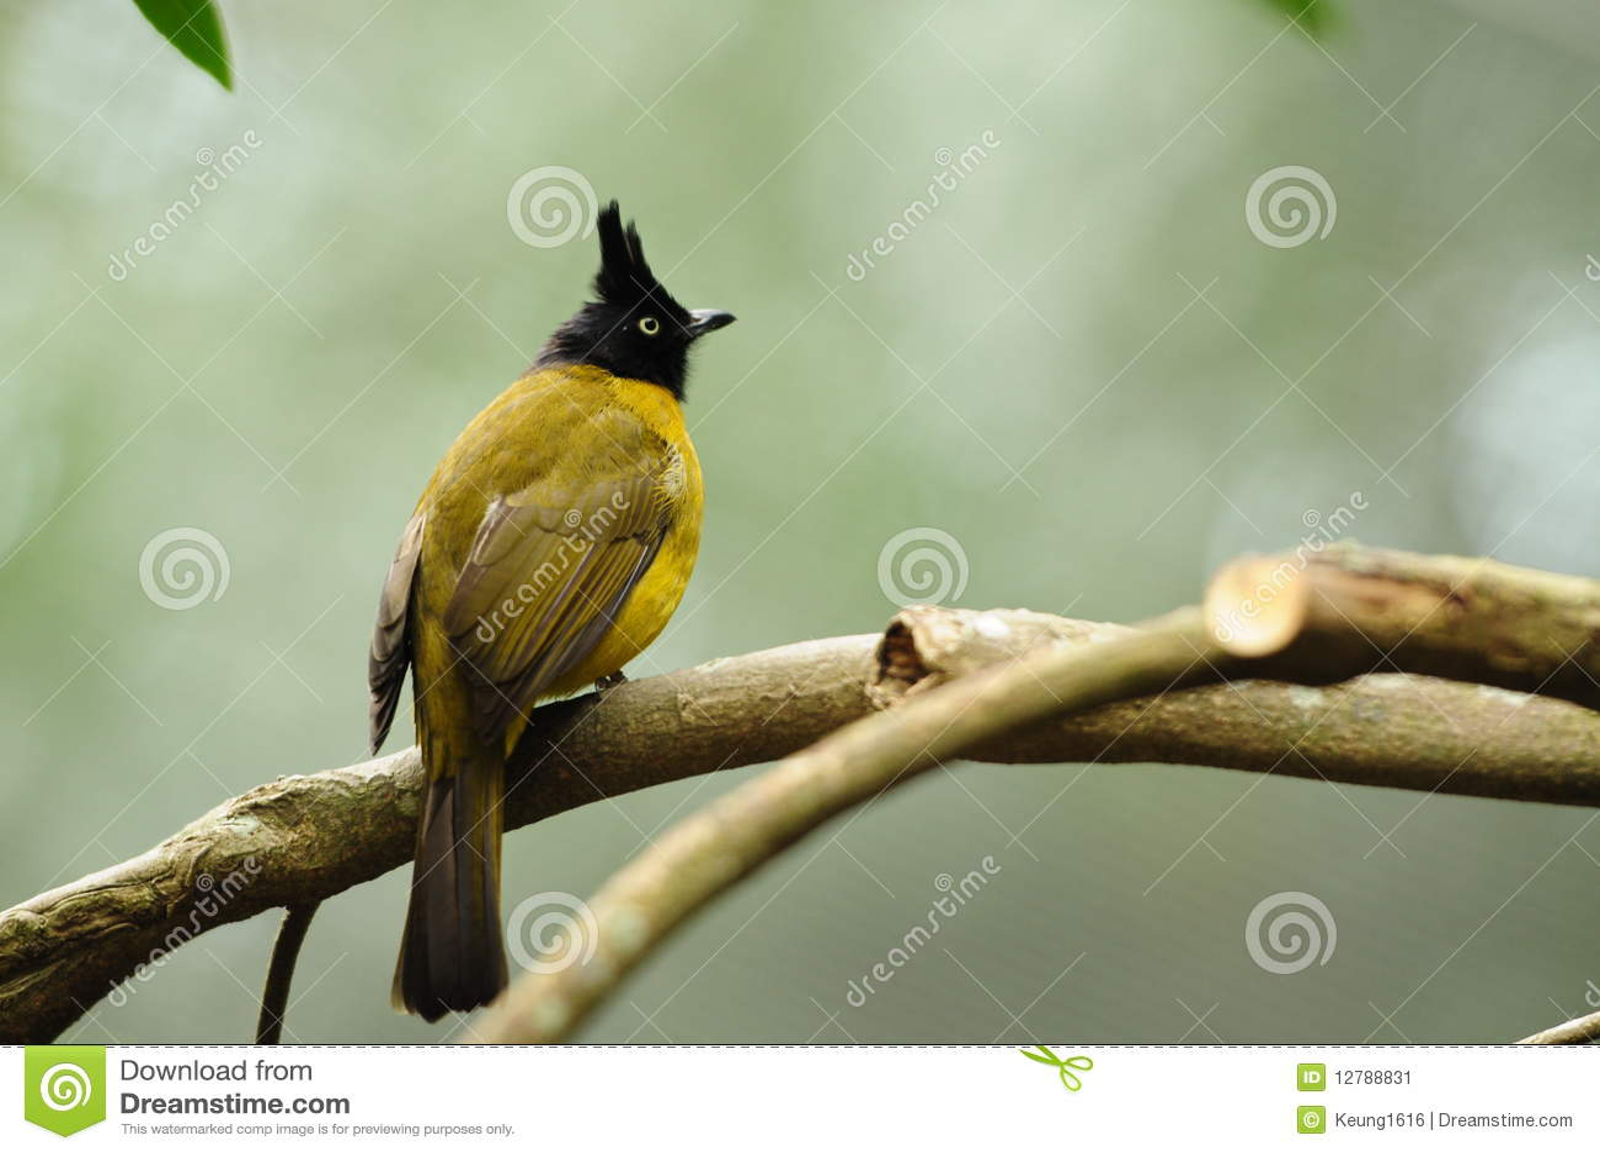 vogel schwarz mit haube gelber bulbul stockbild bild 12788831. Black Bedroom Furniture Sets. Home Design Ideas